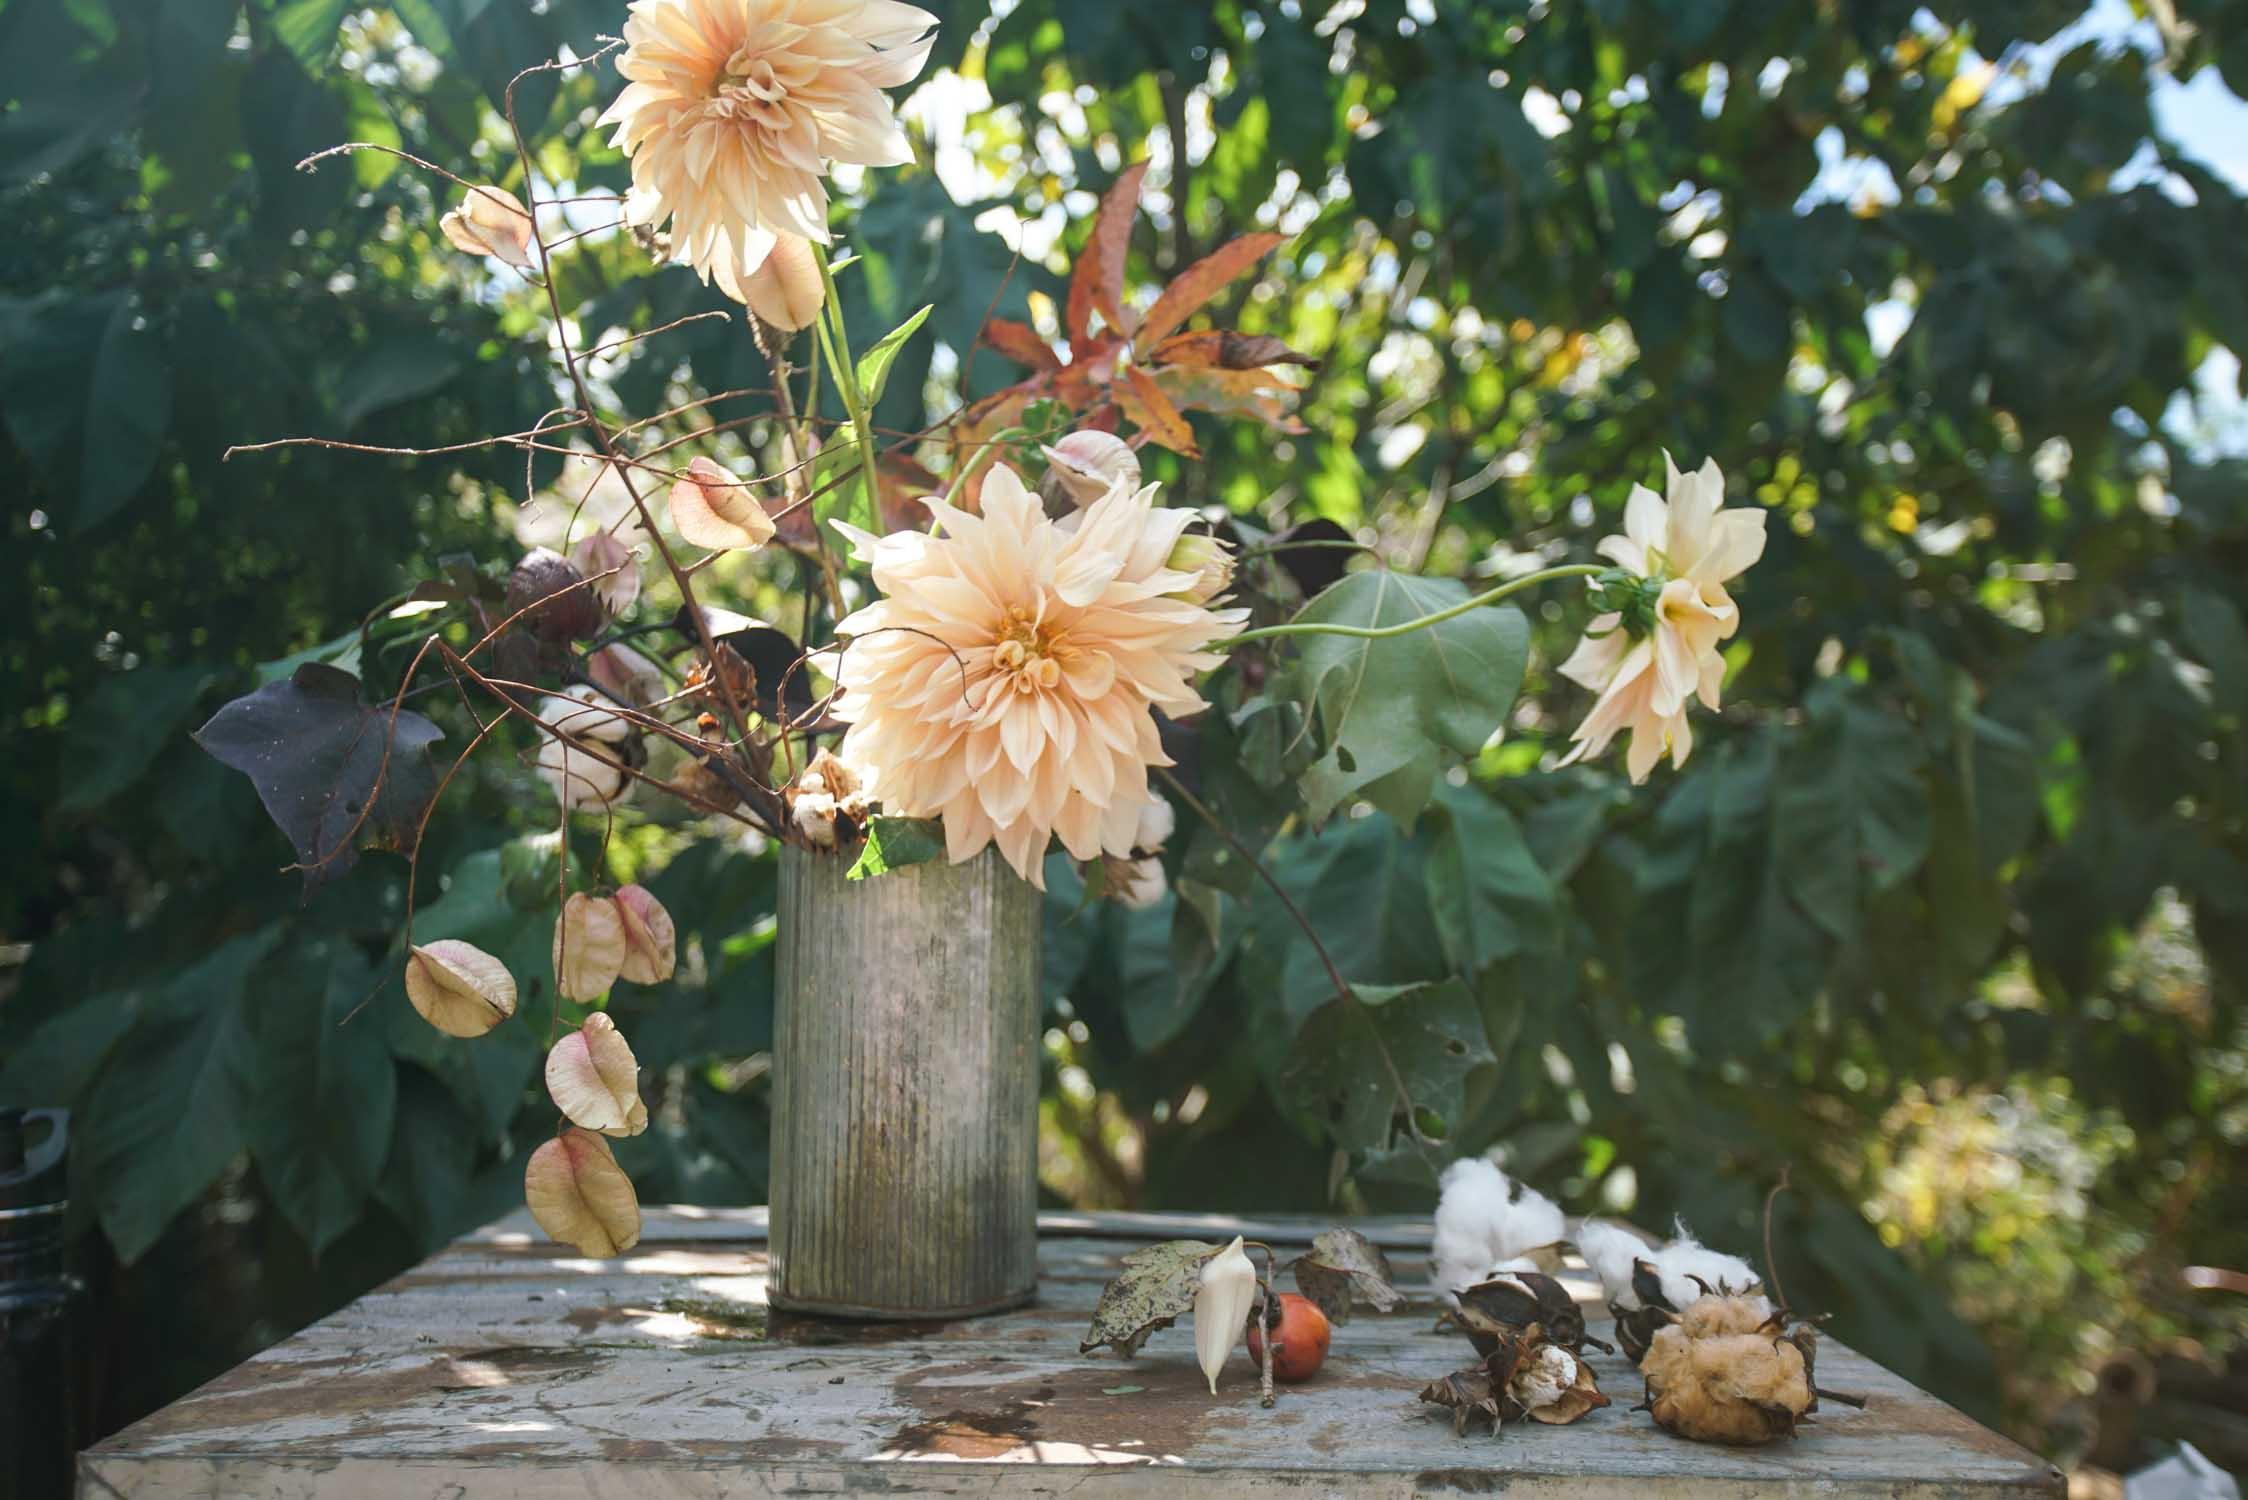 RA_3 porch farm 2016 flower social-2016101709125.jpg